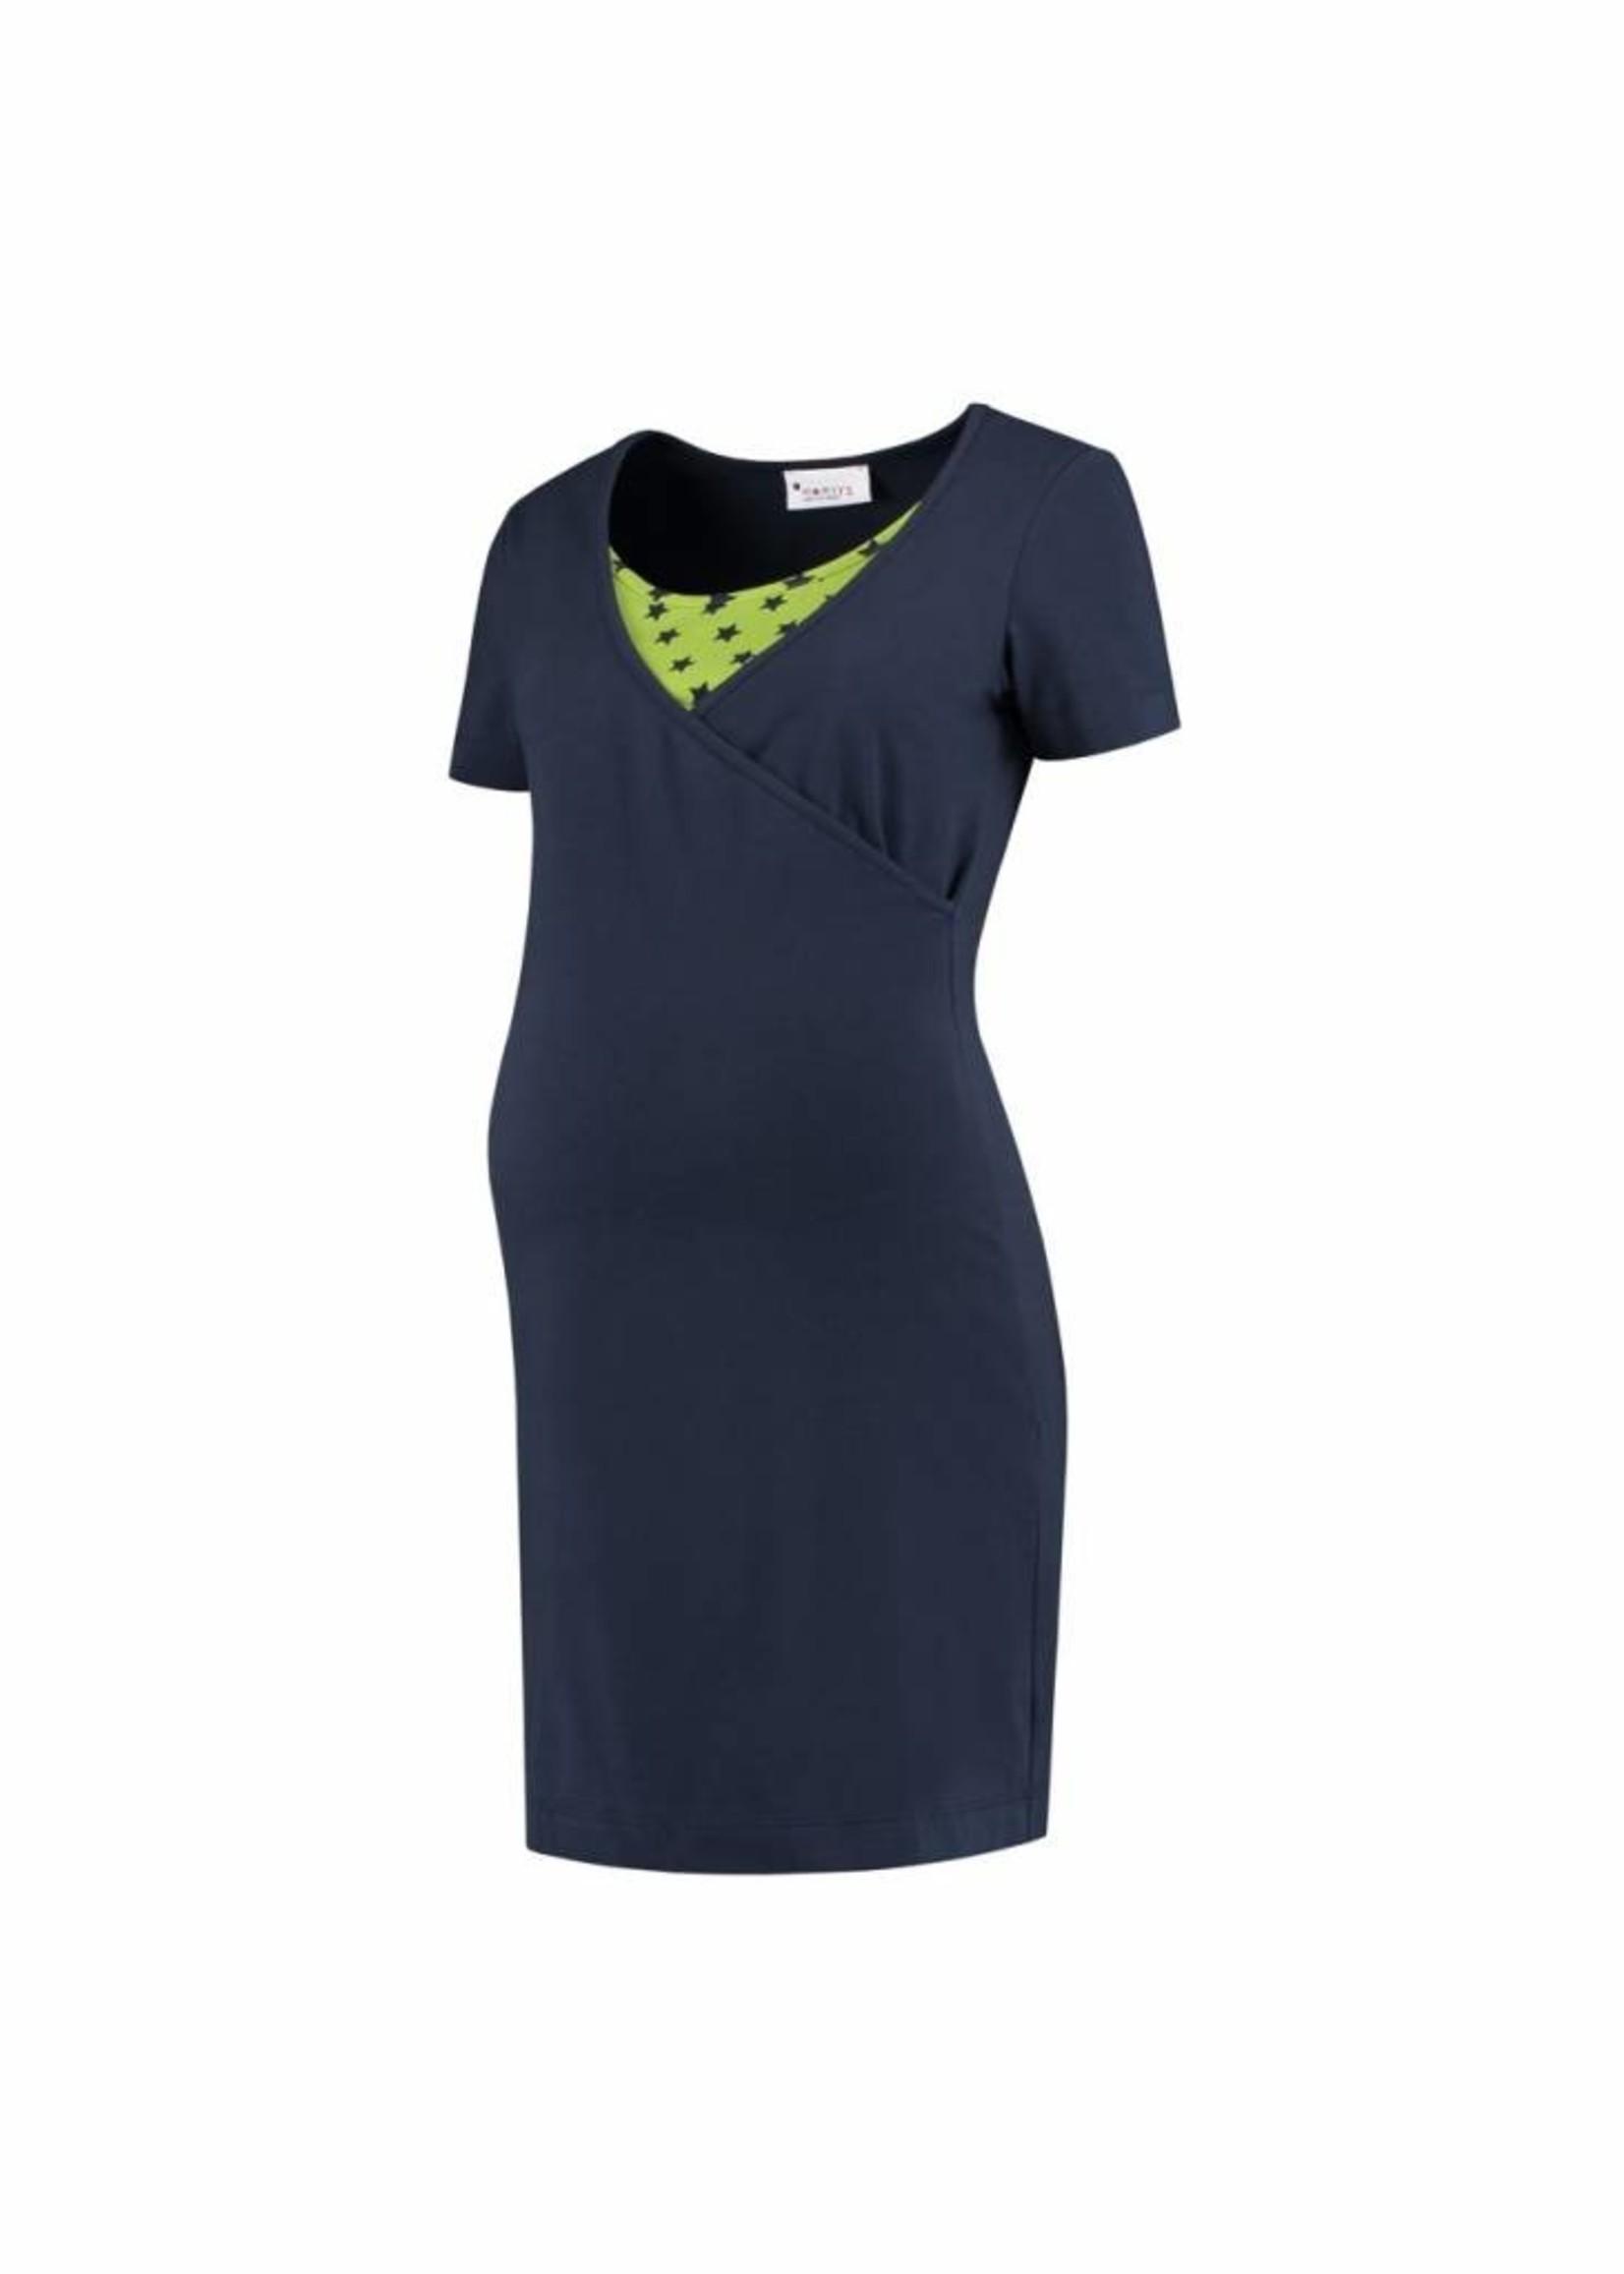 MAMSY Home Wear Dress DBL/S